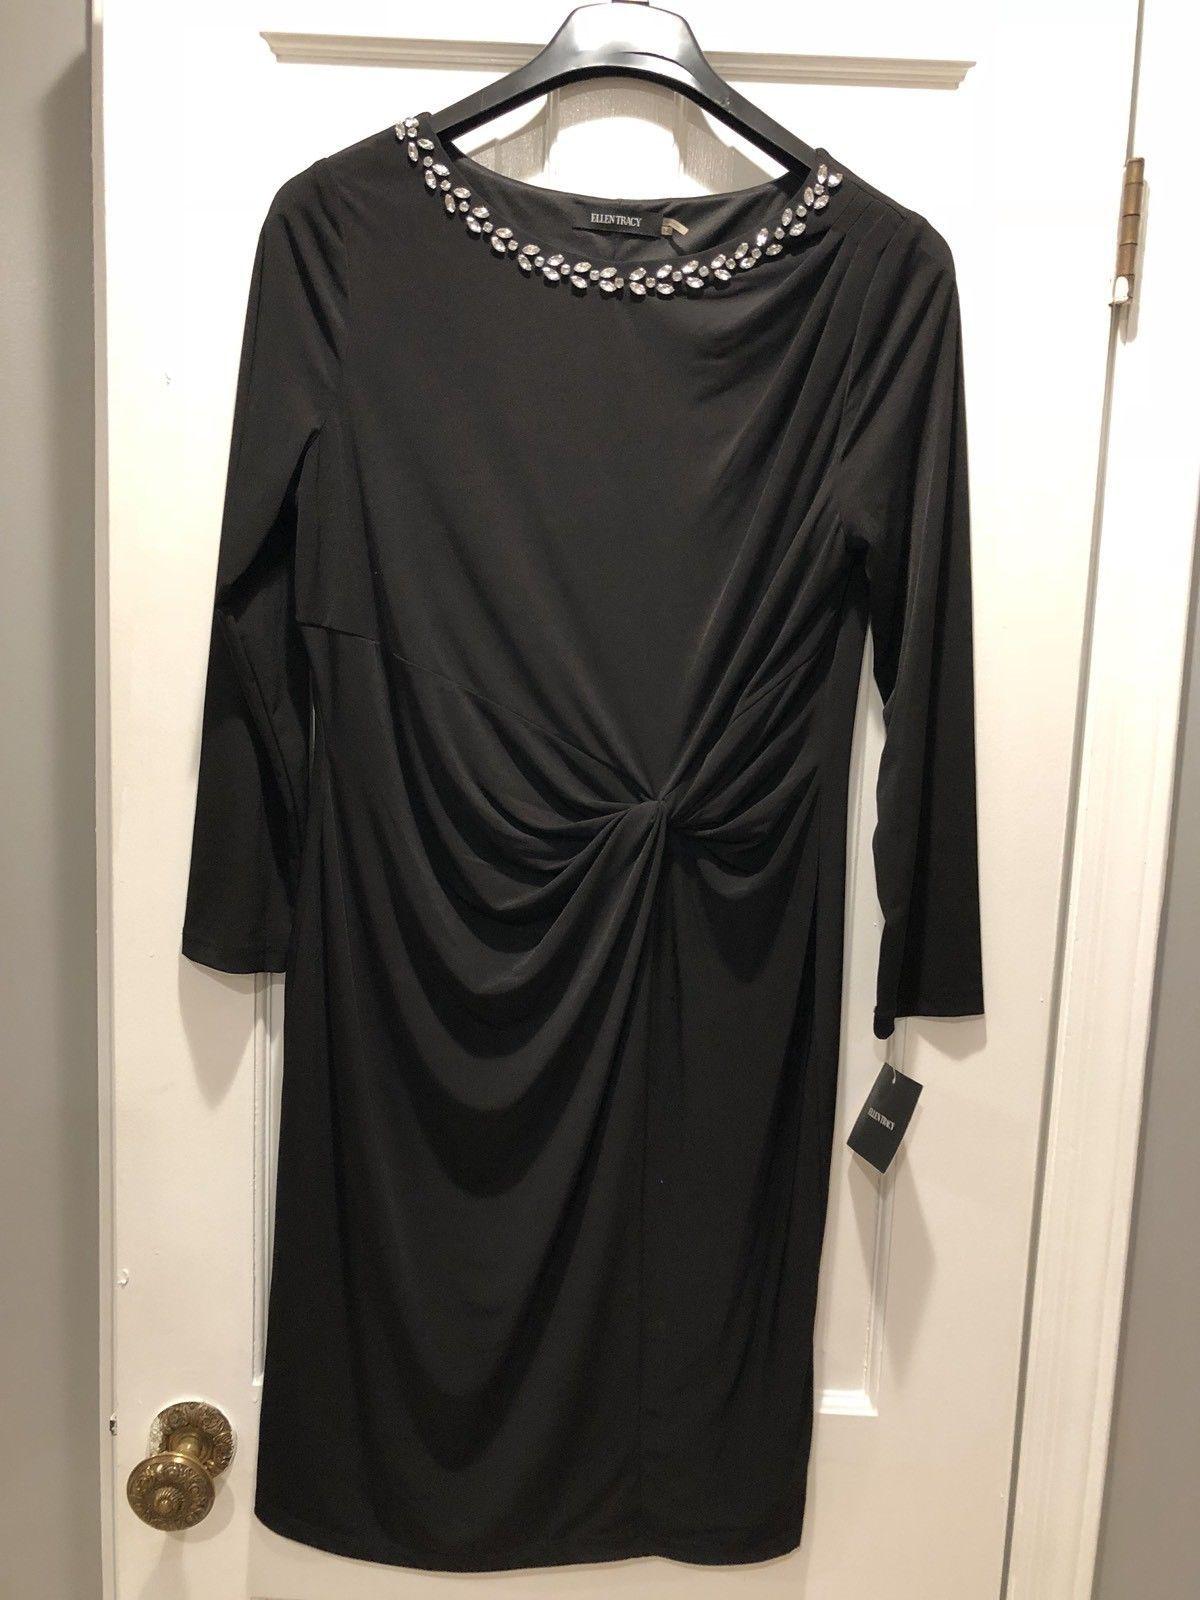 ELLEN TRACY 3 WOMEN'S LONG SLEEVE JERSEY DRESS WITH A JEWELED NECKLINE